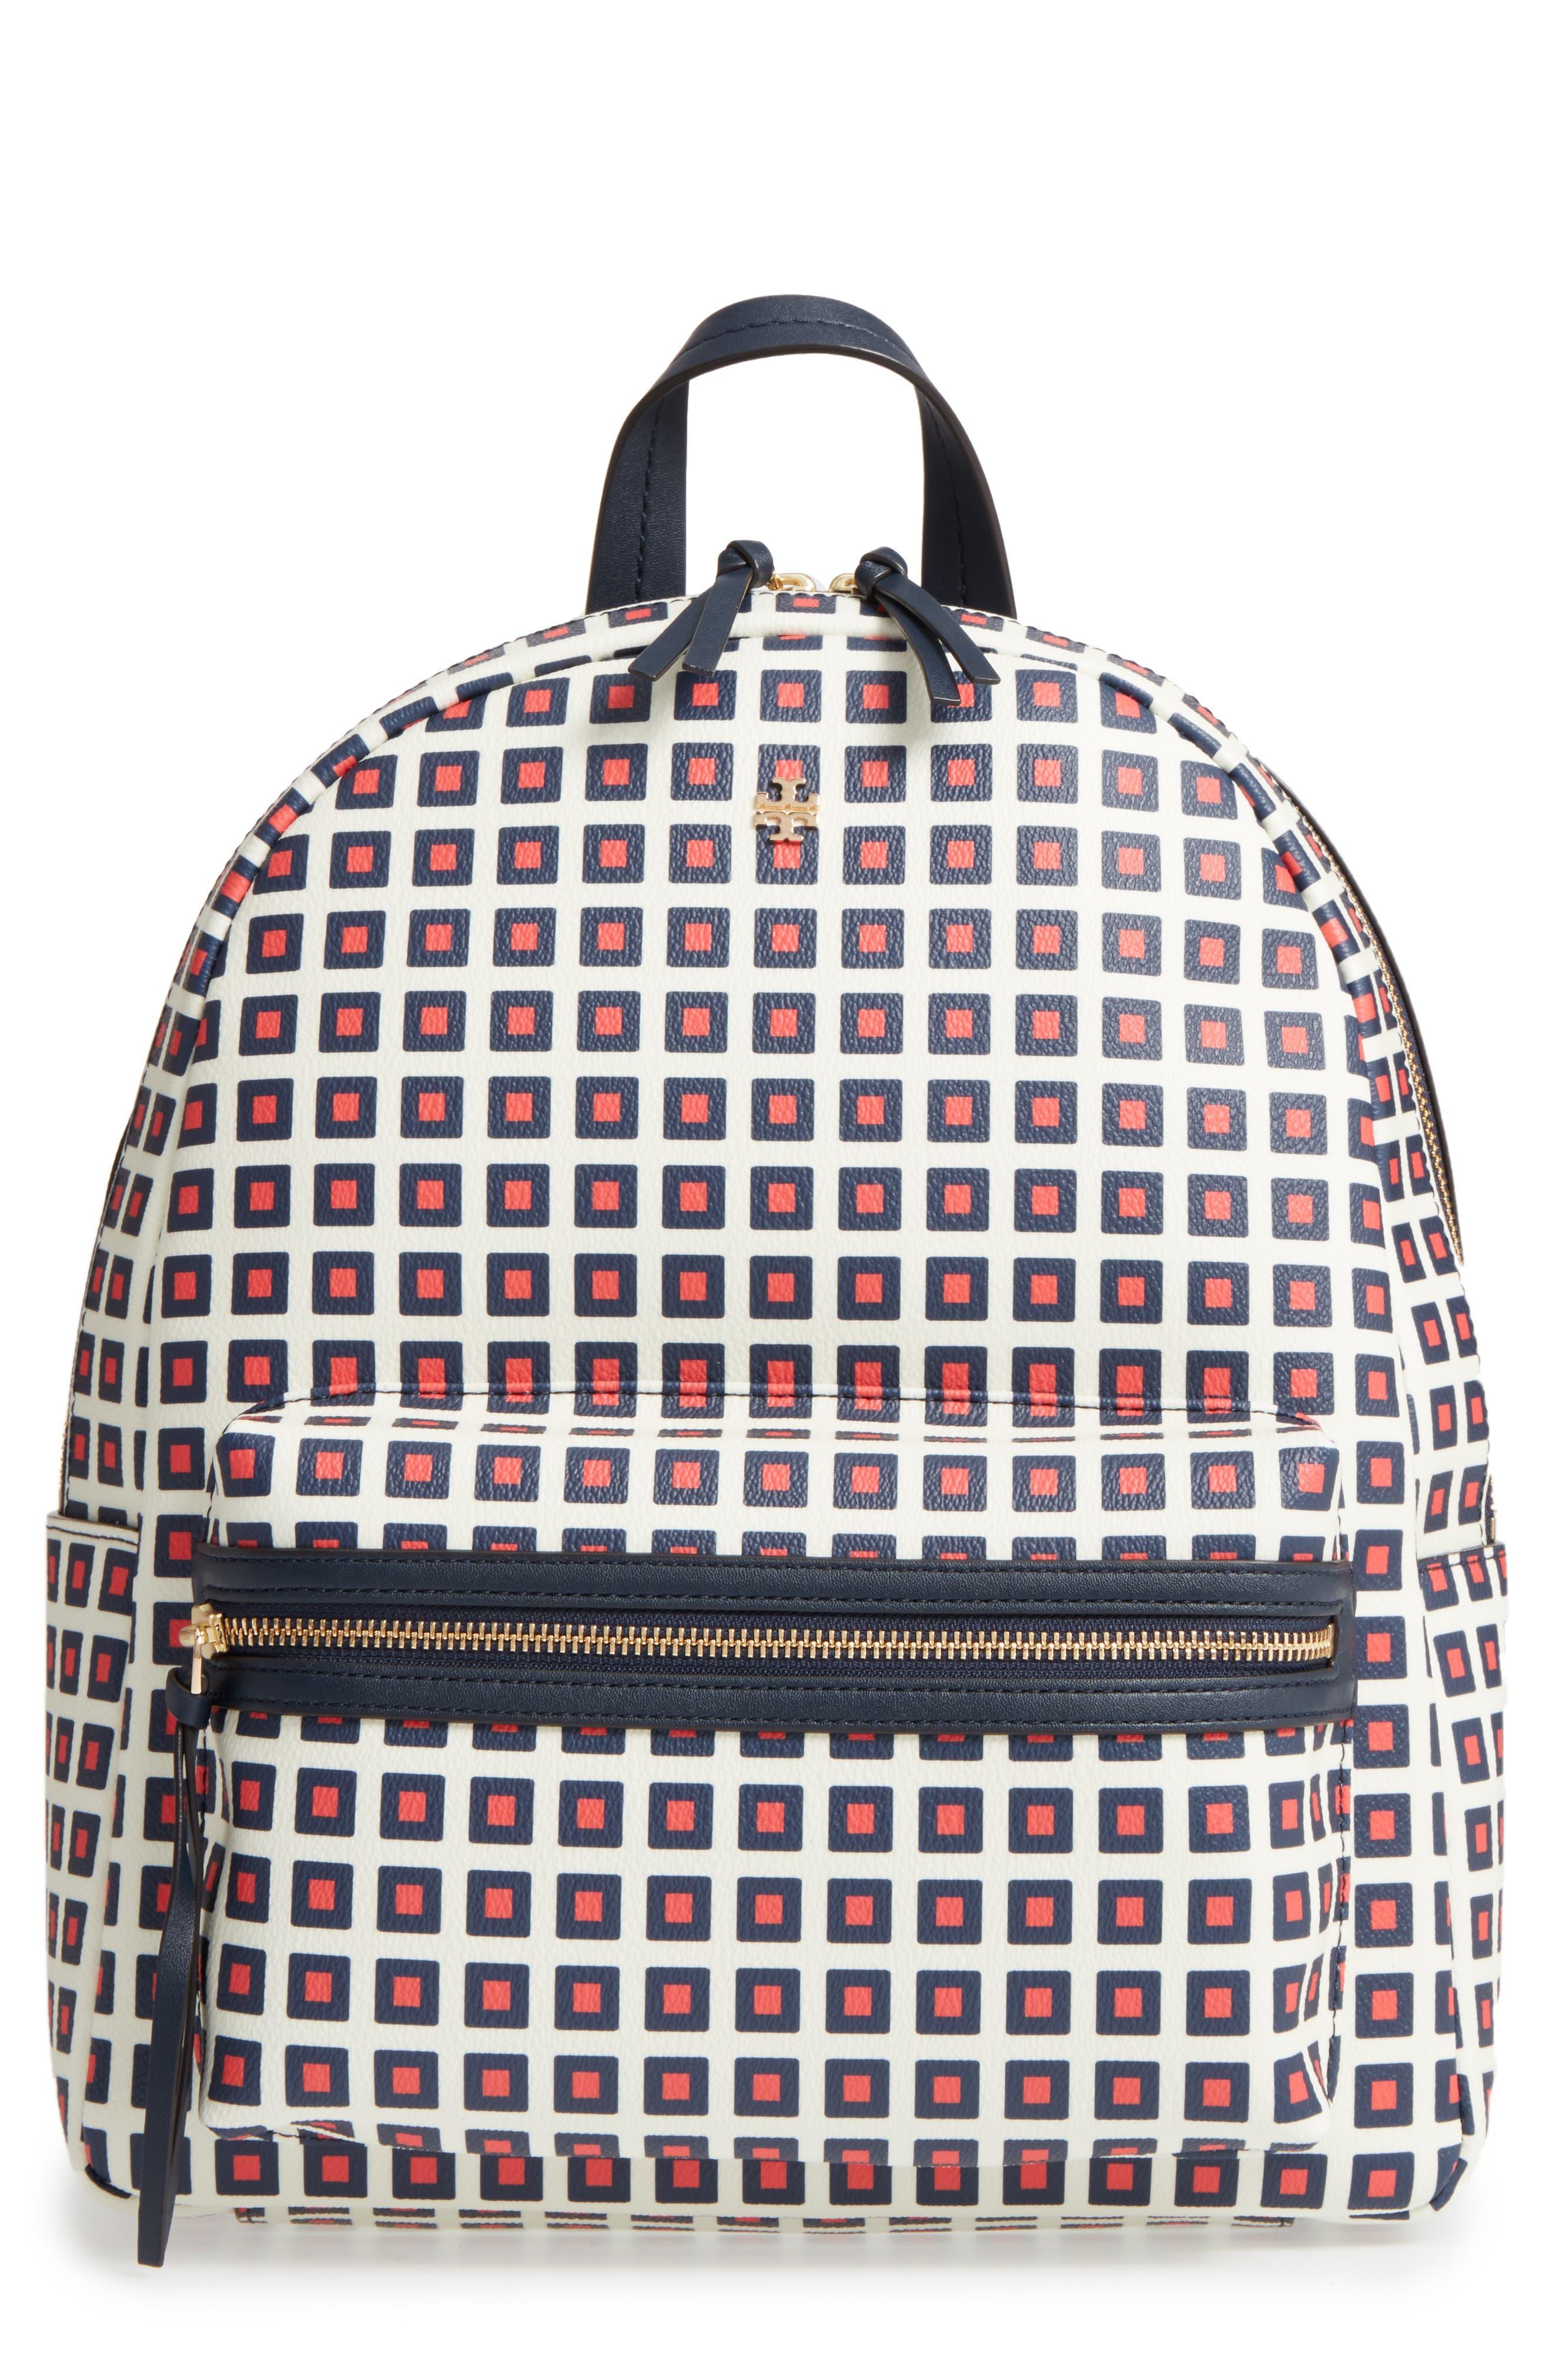 Tory Burch Kerrington Faux Leather Backpack